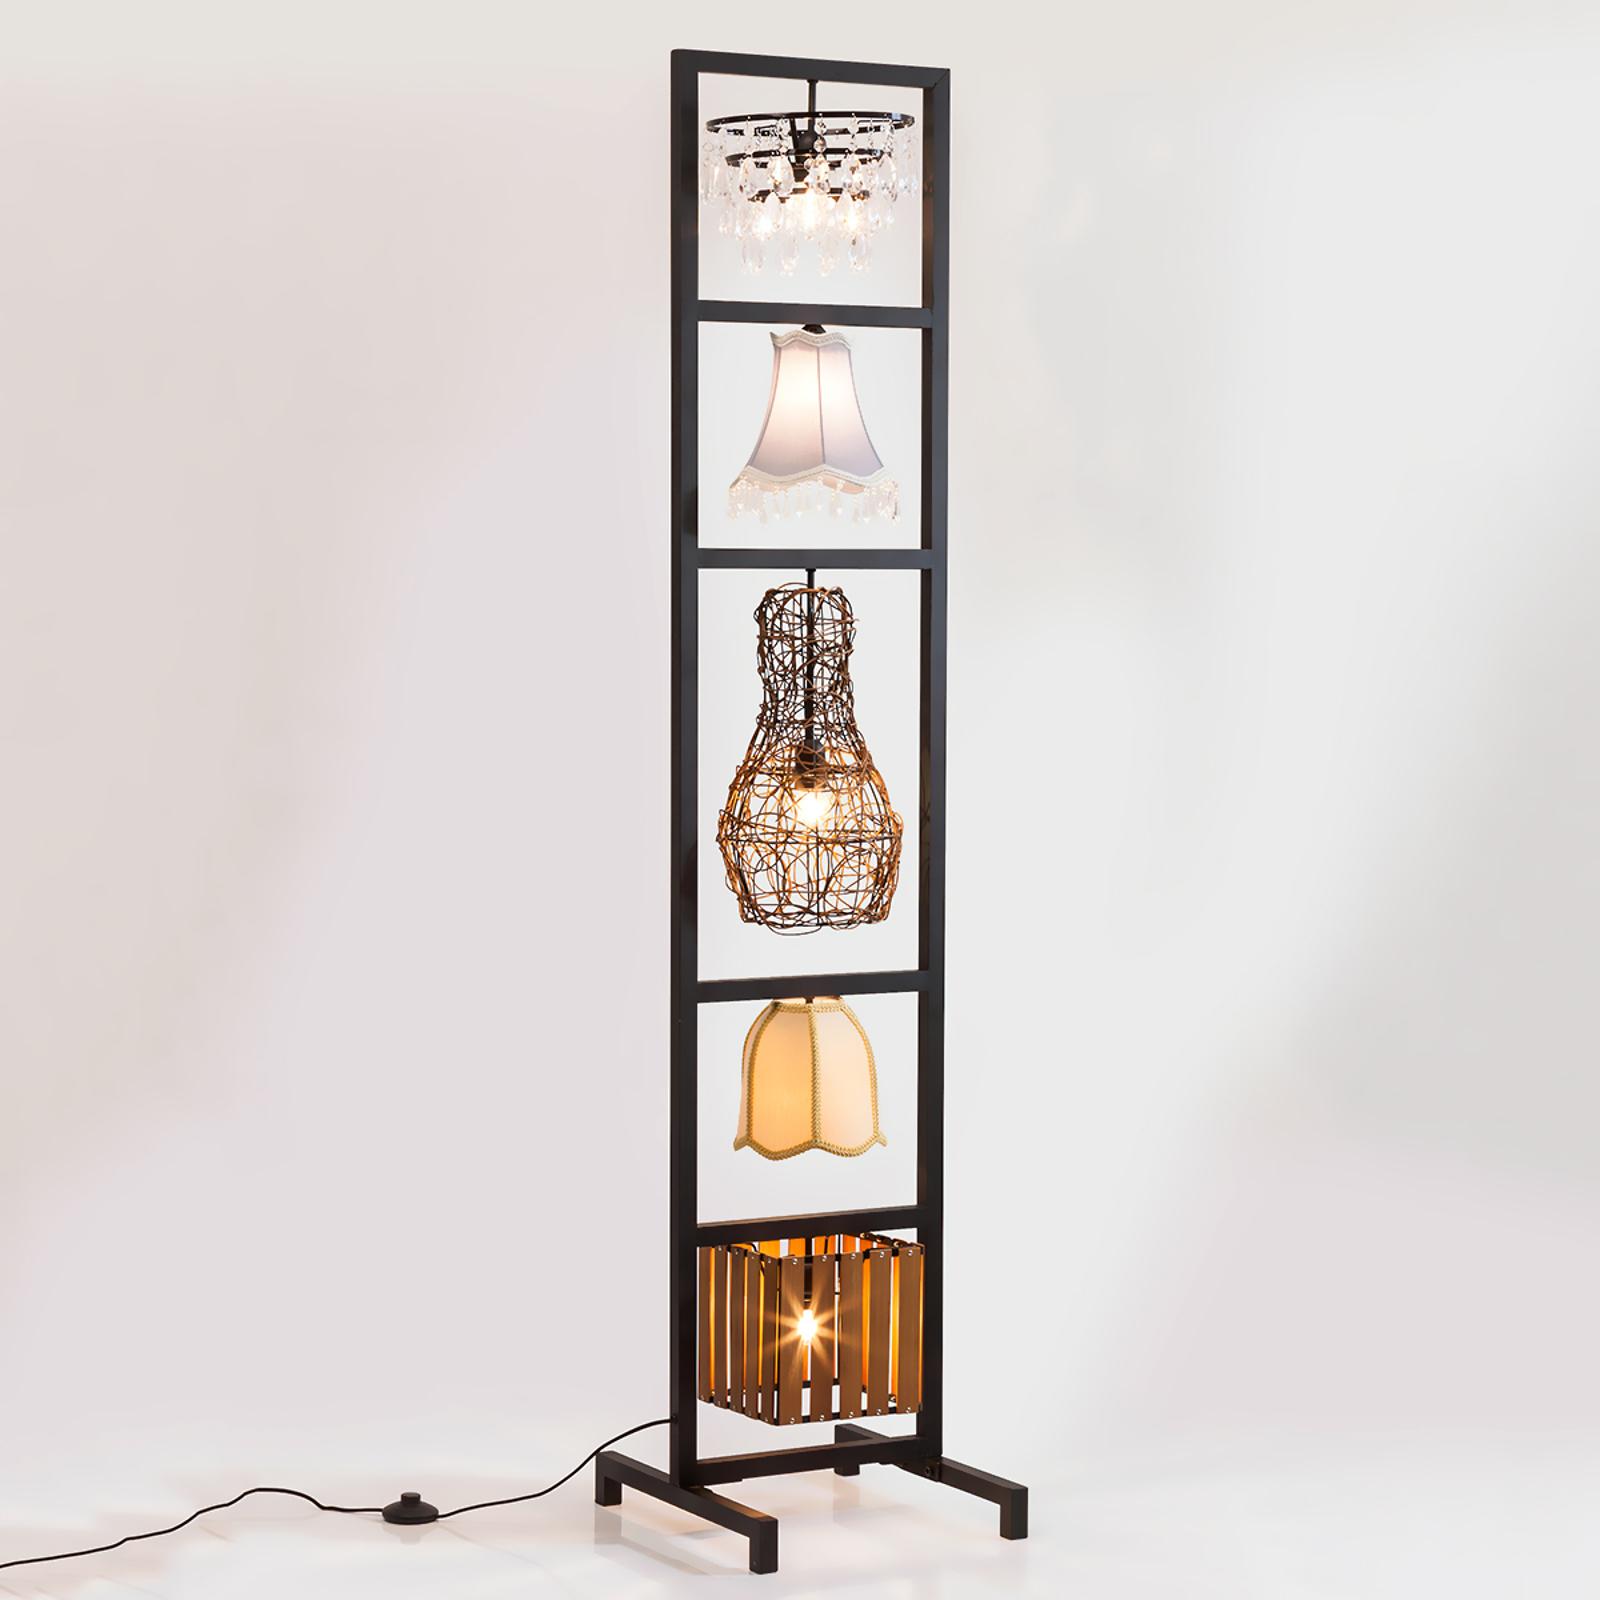 KARE Parecchi Art House vloerlamp